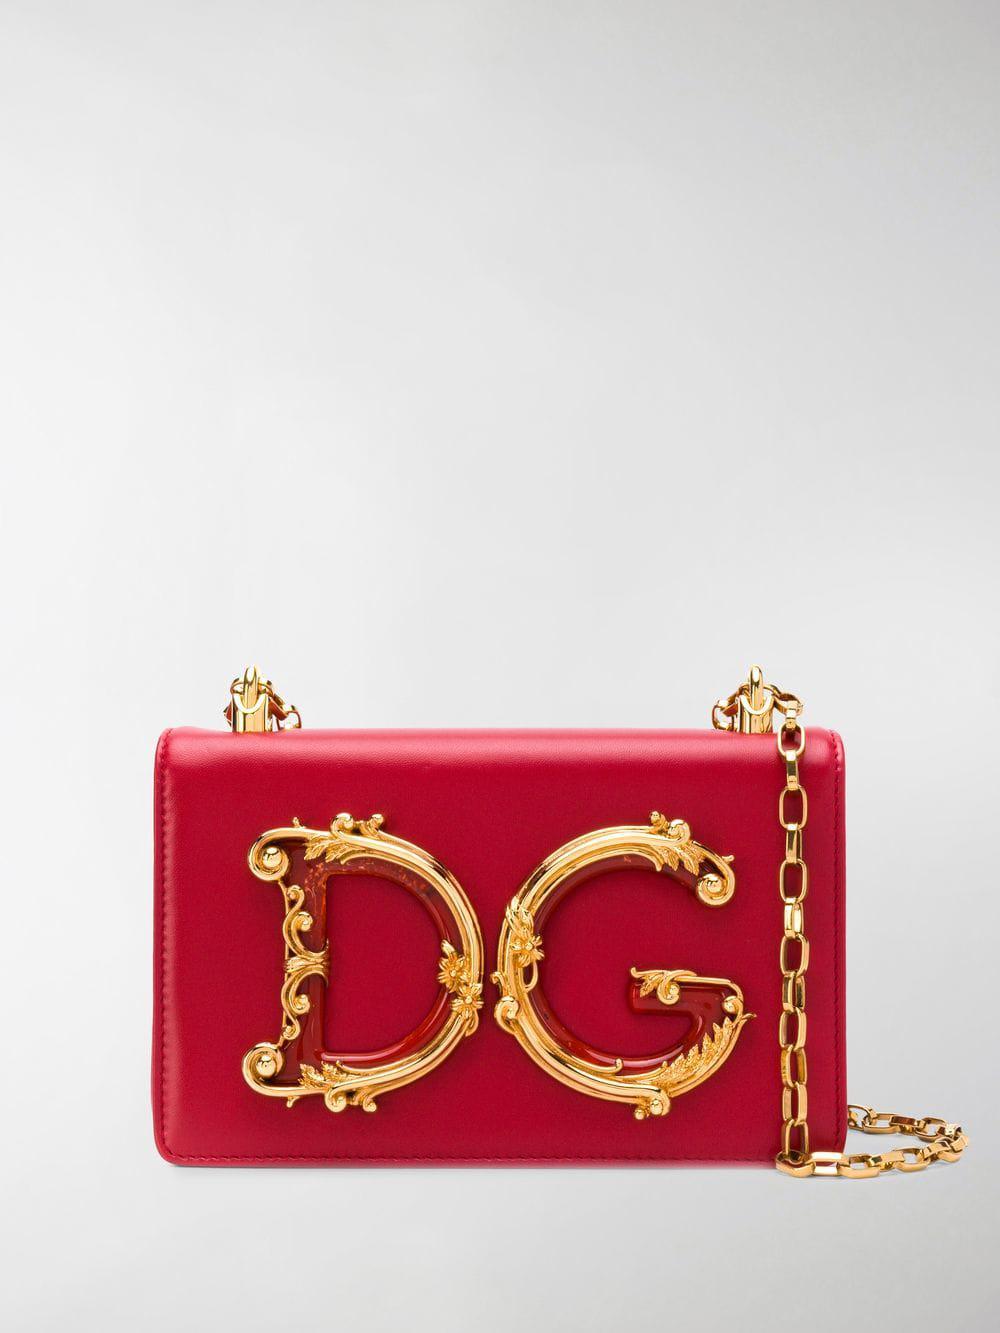 ddfda8c4b239 Dolce   Gabbana Foldover Logo Shoulder Bag in Red - Lyst